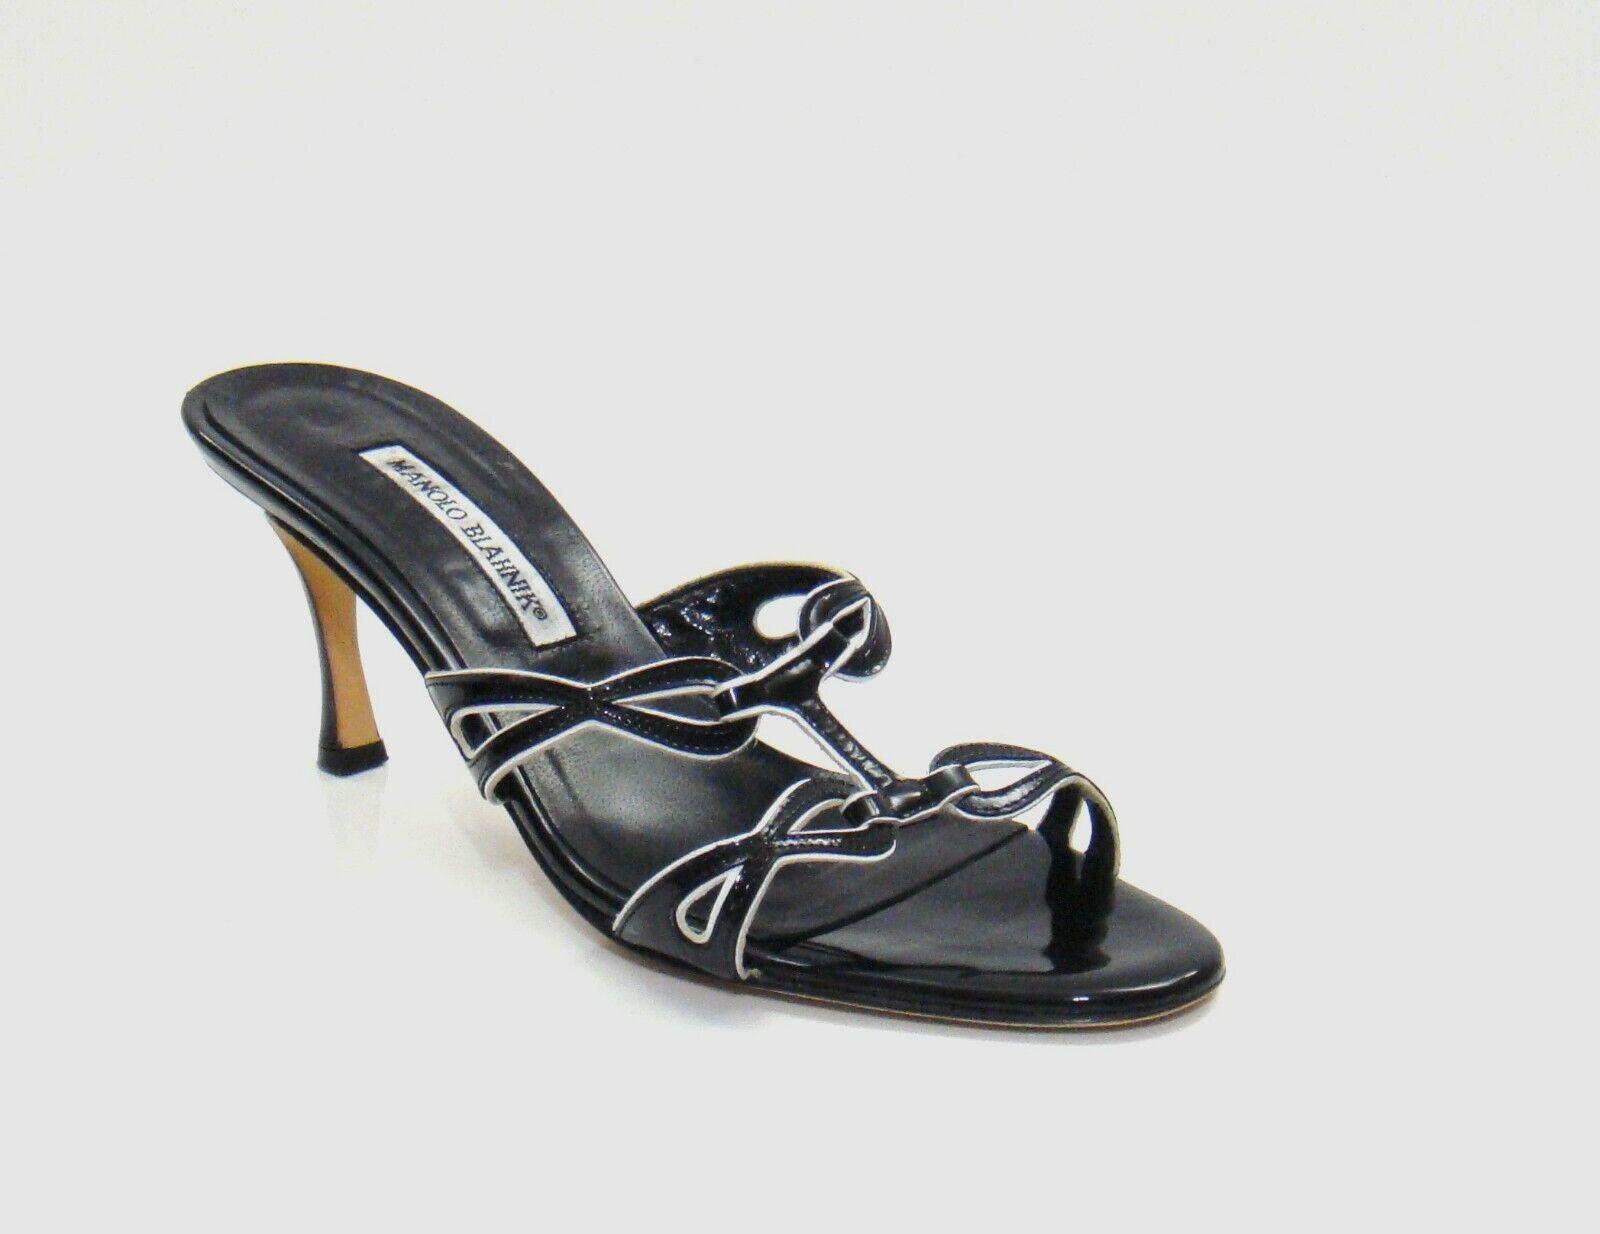 Manolo Blahnik Black & White Patent Leather Slide Sandals Size 39 9